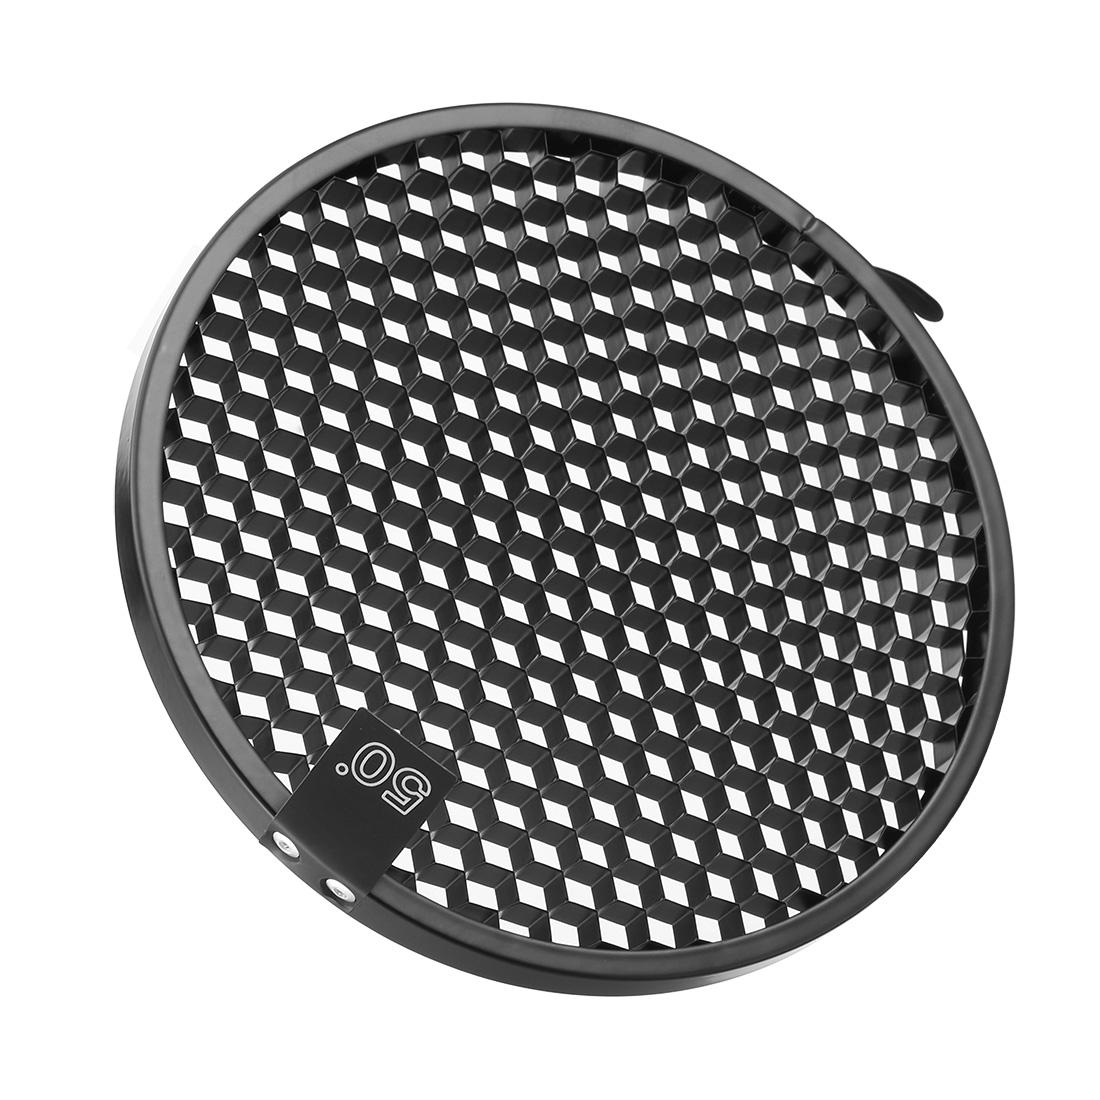 50 Degree Honeycomb Grid Black for 7-inch Reflector Diffuser Lamp Shade Dish